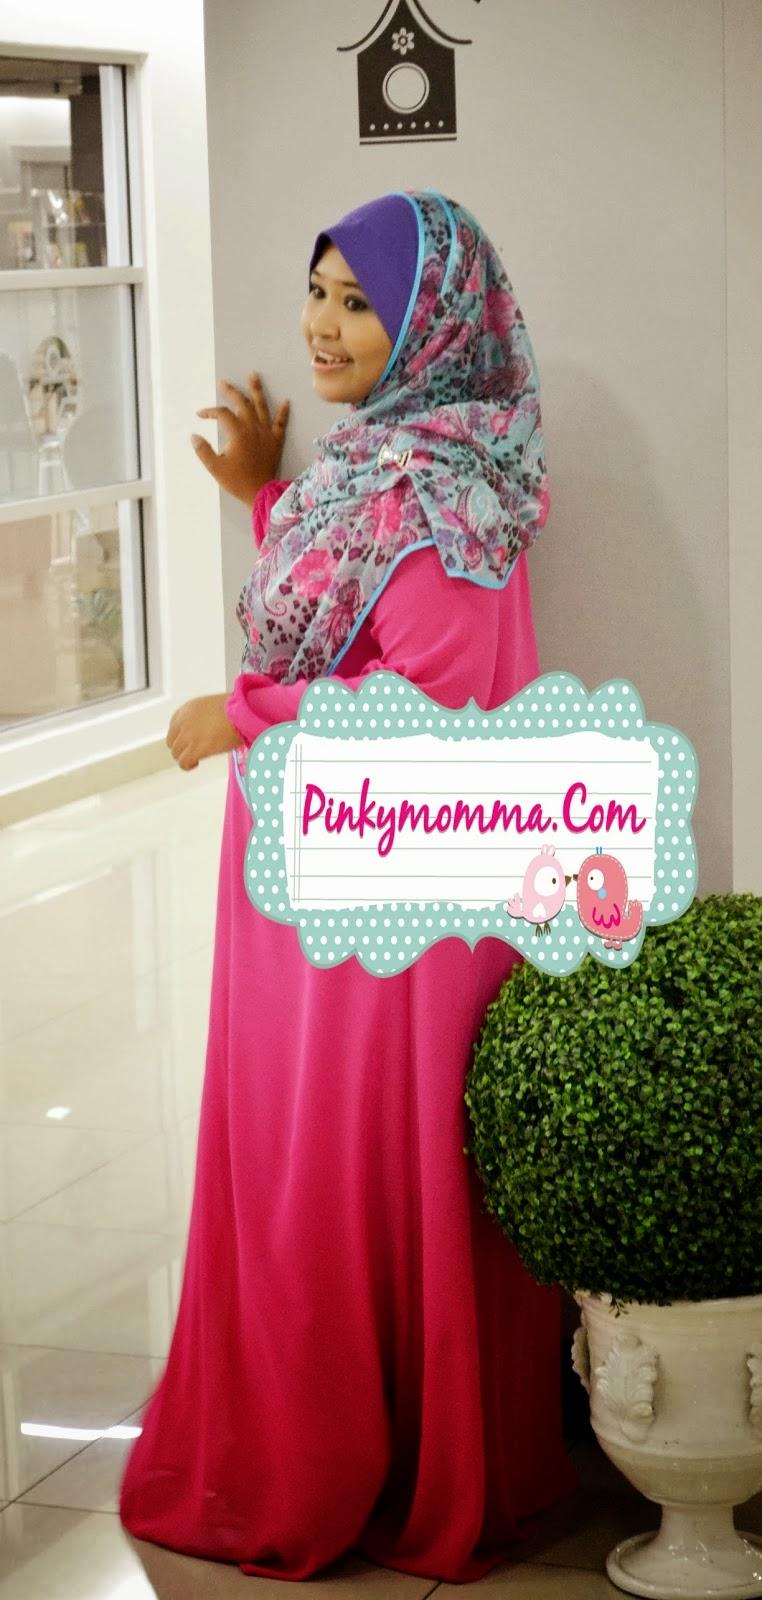 Pinky Momma